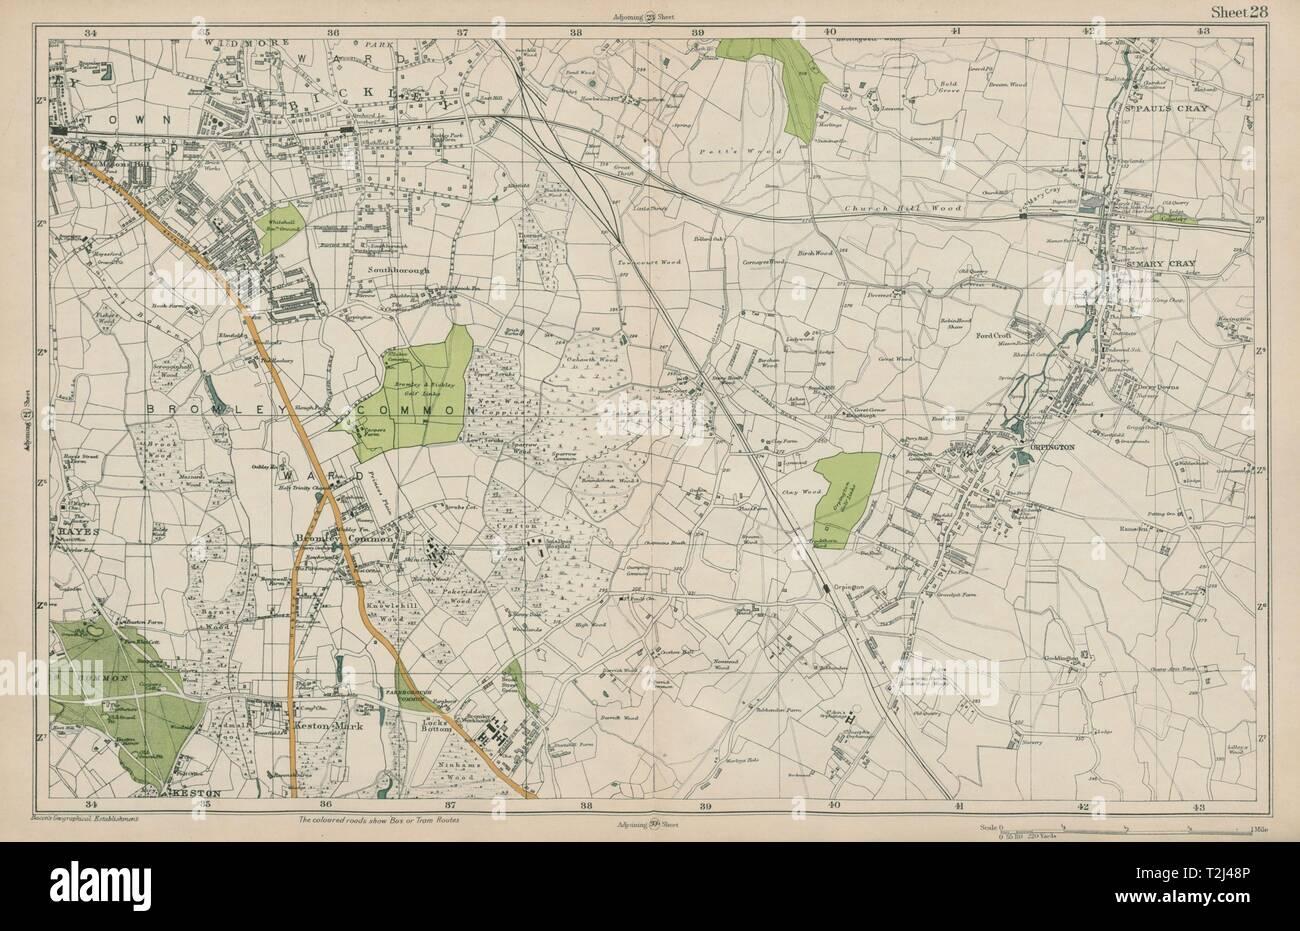 BROMLEY & ORPINGTON Hayes Petts Wood Keston St Paul's Mary Cray. BACON  1919 map - Stock Image